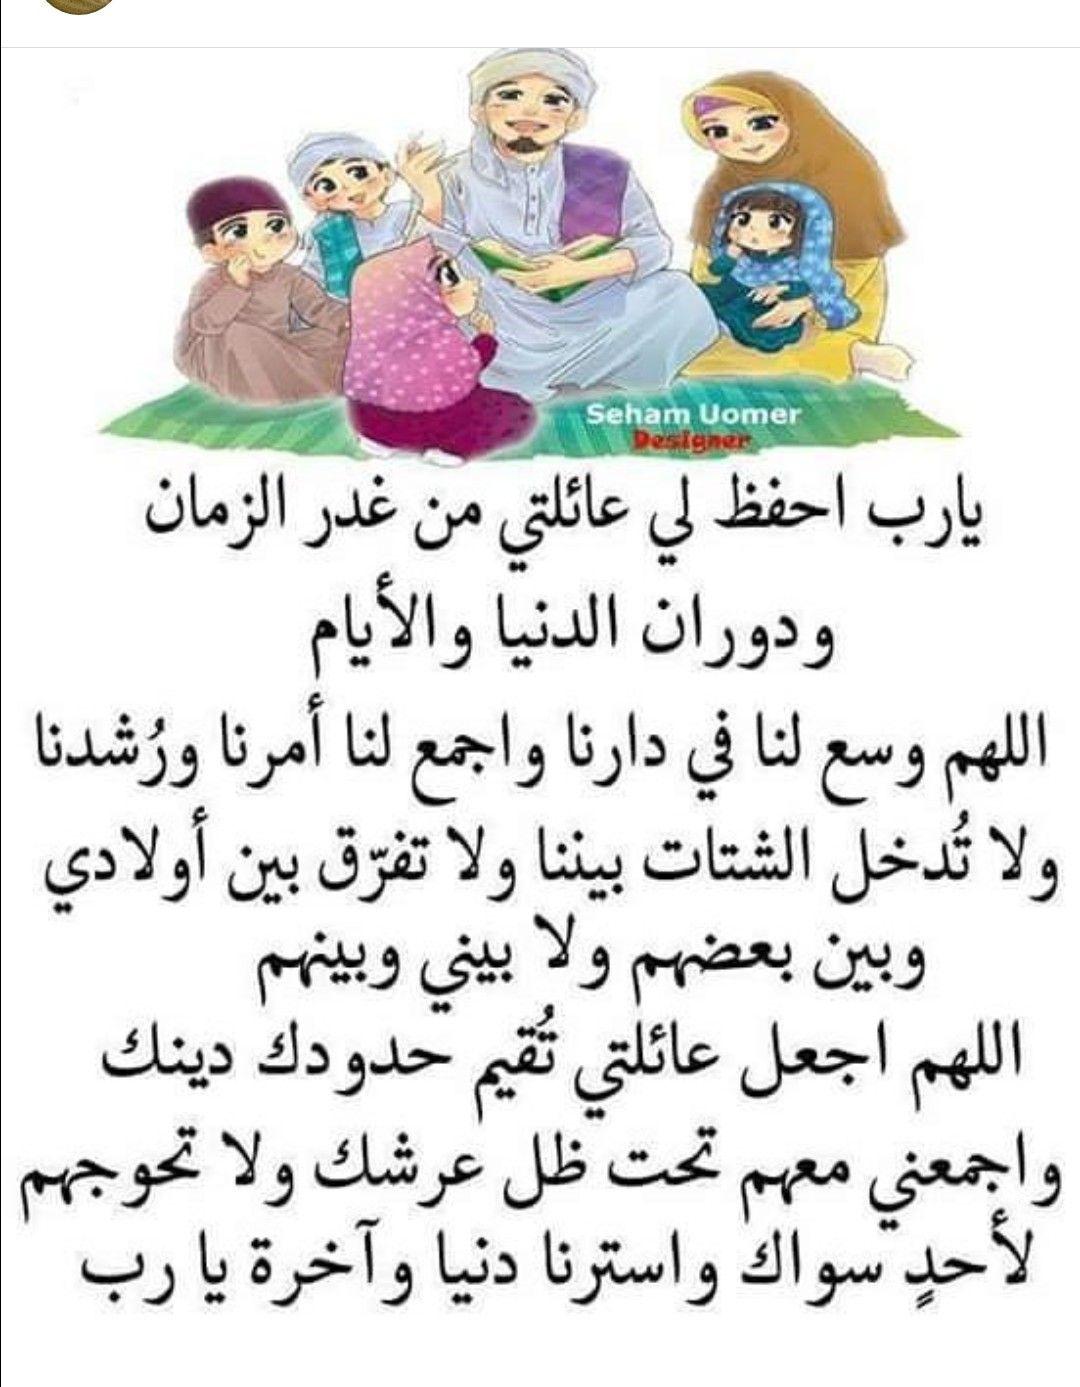 Pin By Salsabil On دعاء إلى رب غفور Islam Facts Islamic Inspirational Quotes Islamic Phrases